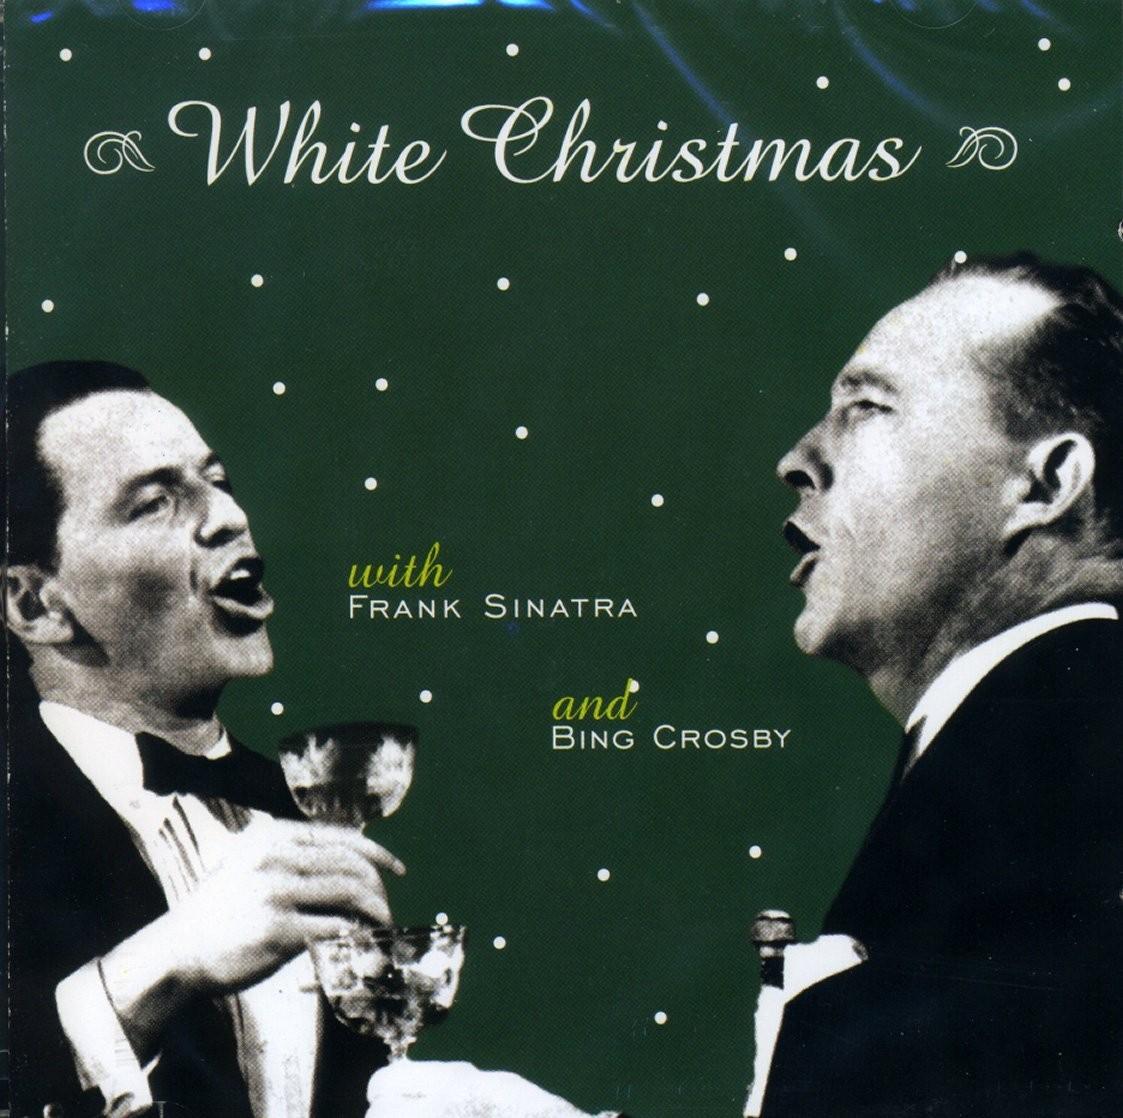 frank sinatra bing crosby white christmas blue moon - Bing Crosby White Christmas Album